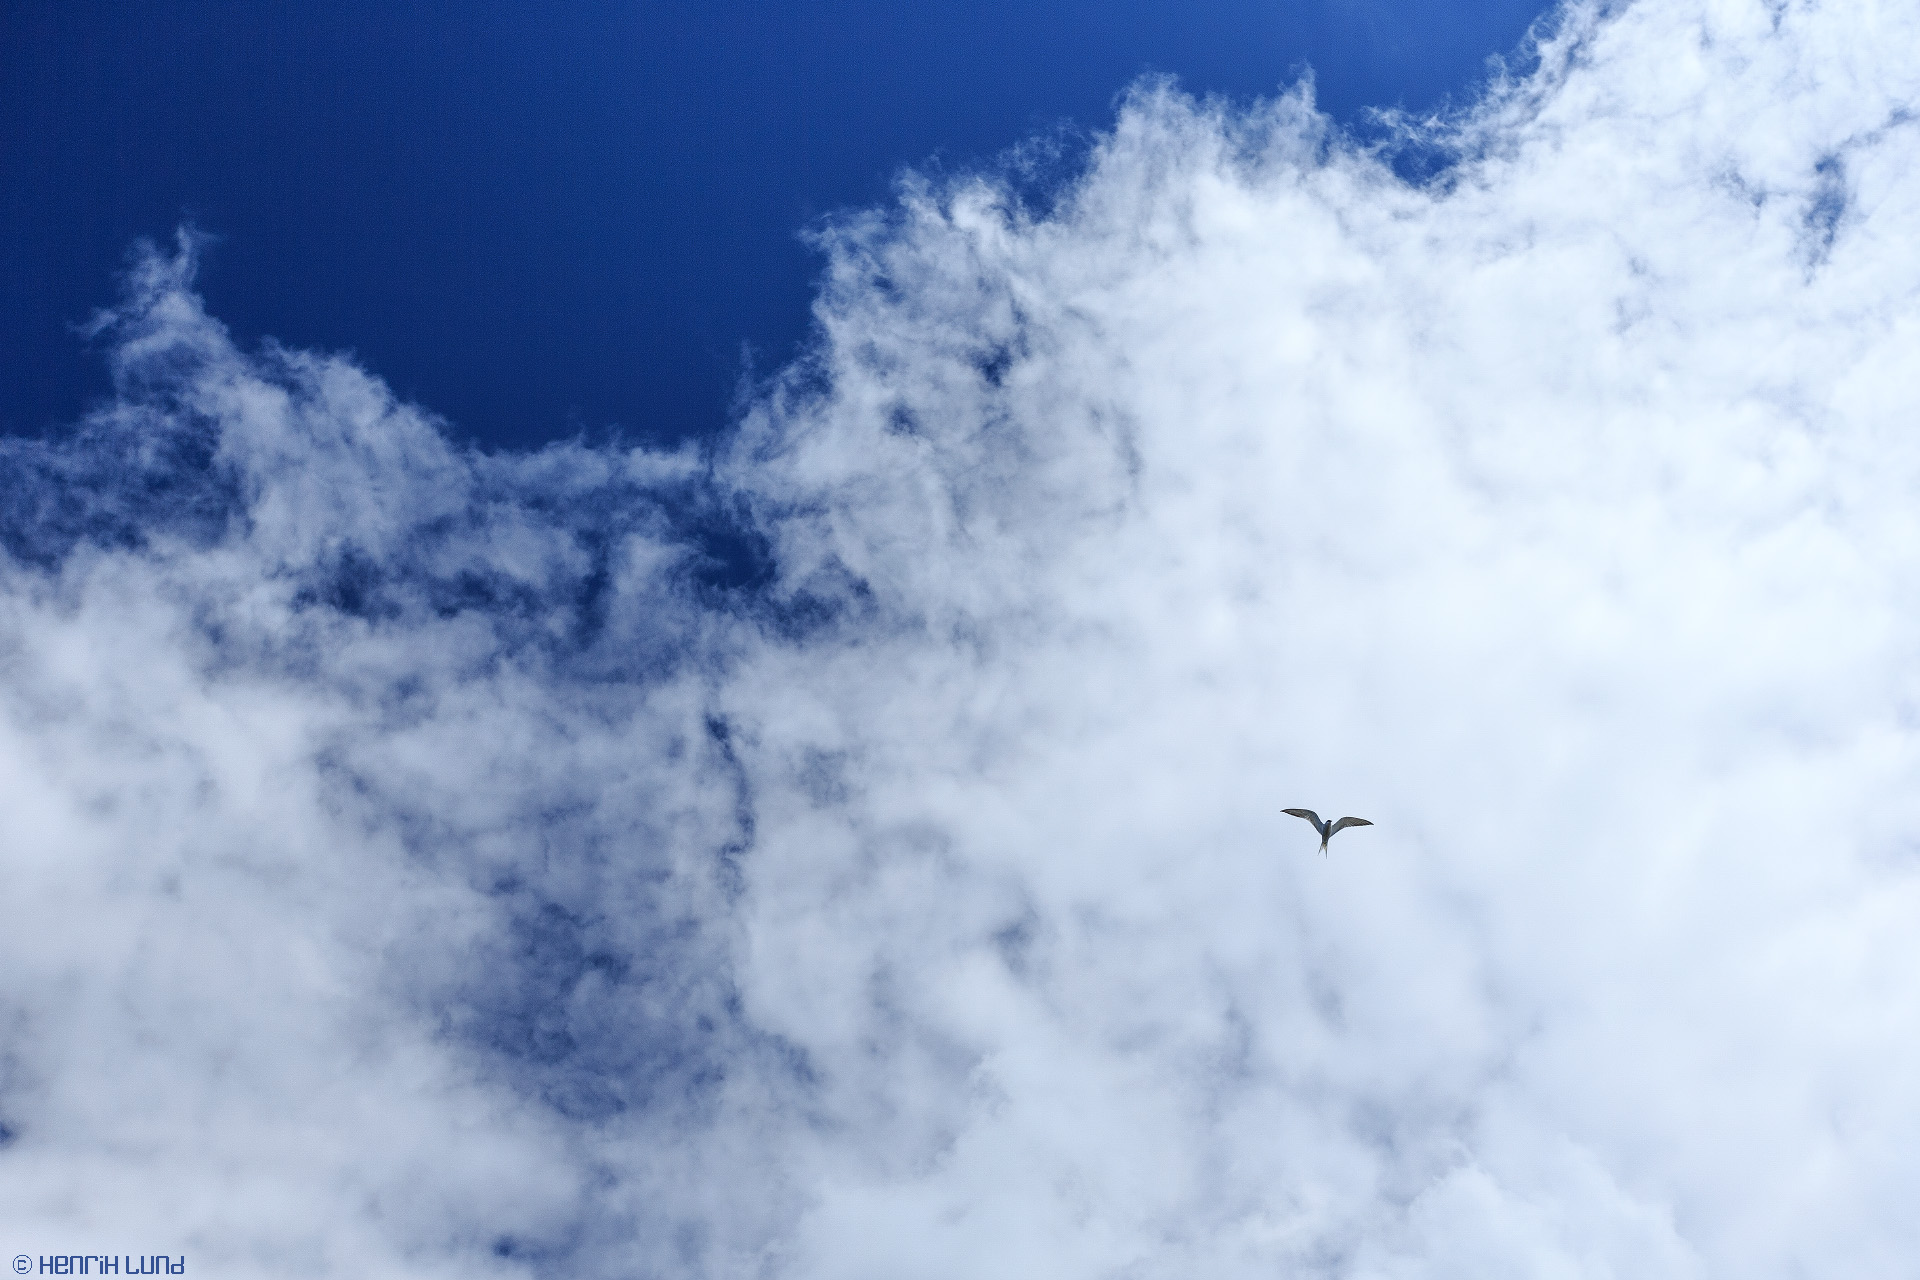 A common tern flying over against a summer sky. Stora Mistö, Raseborg, Finland, July 2013.